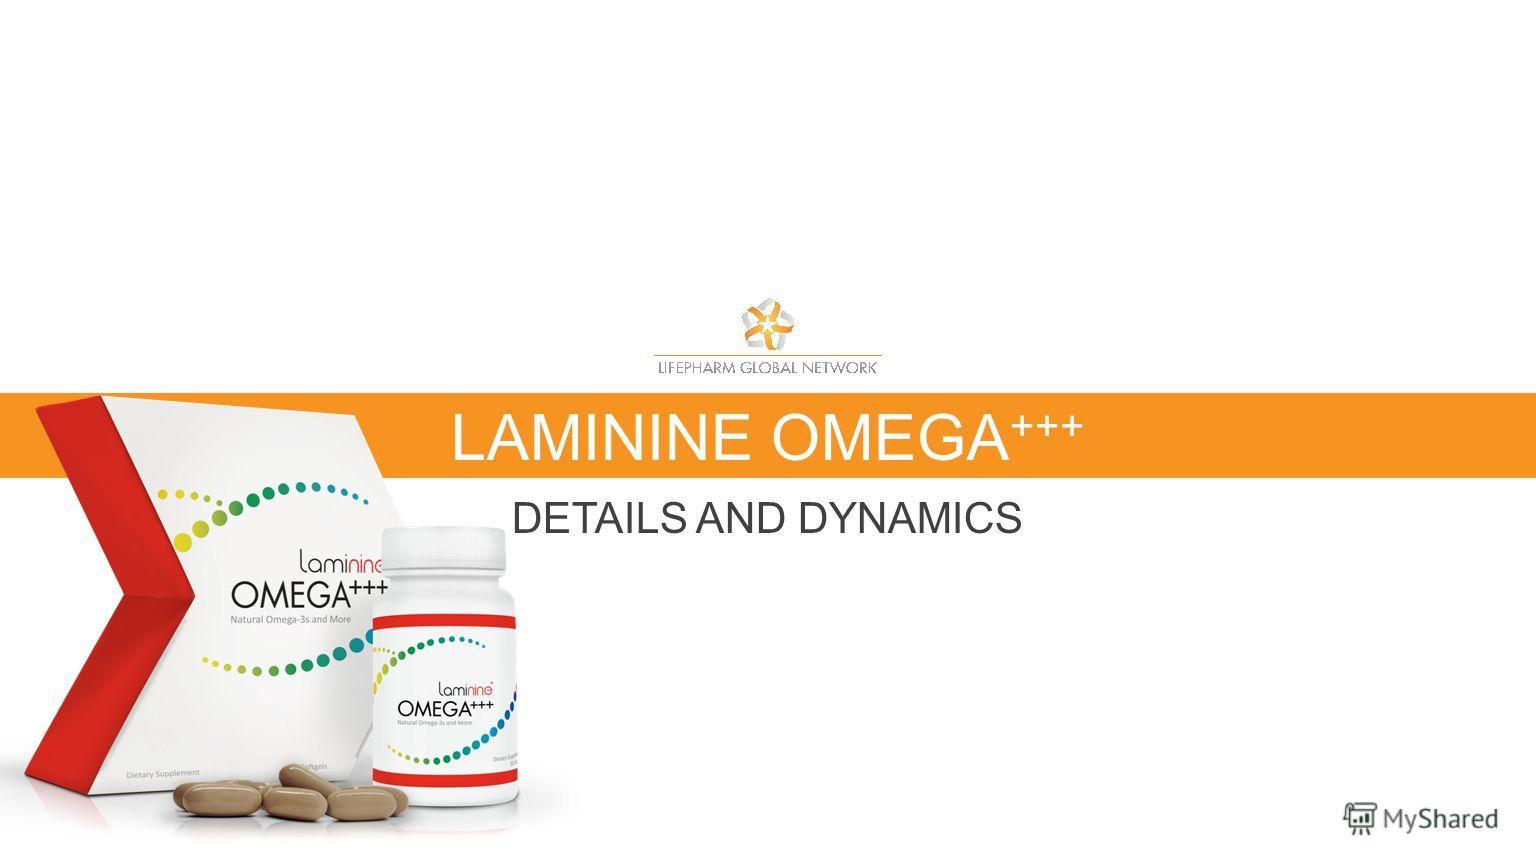 LAMININE OMEGA +++ DETAILS AND DYNAMICS